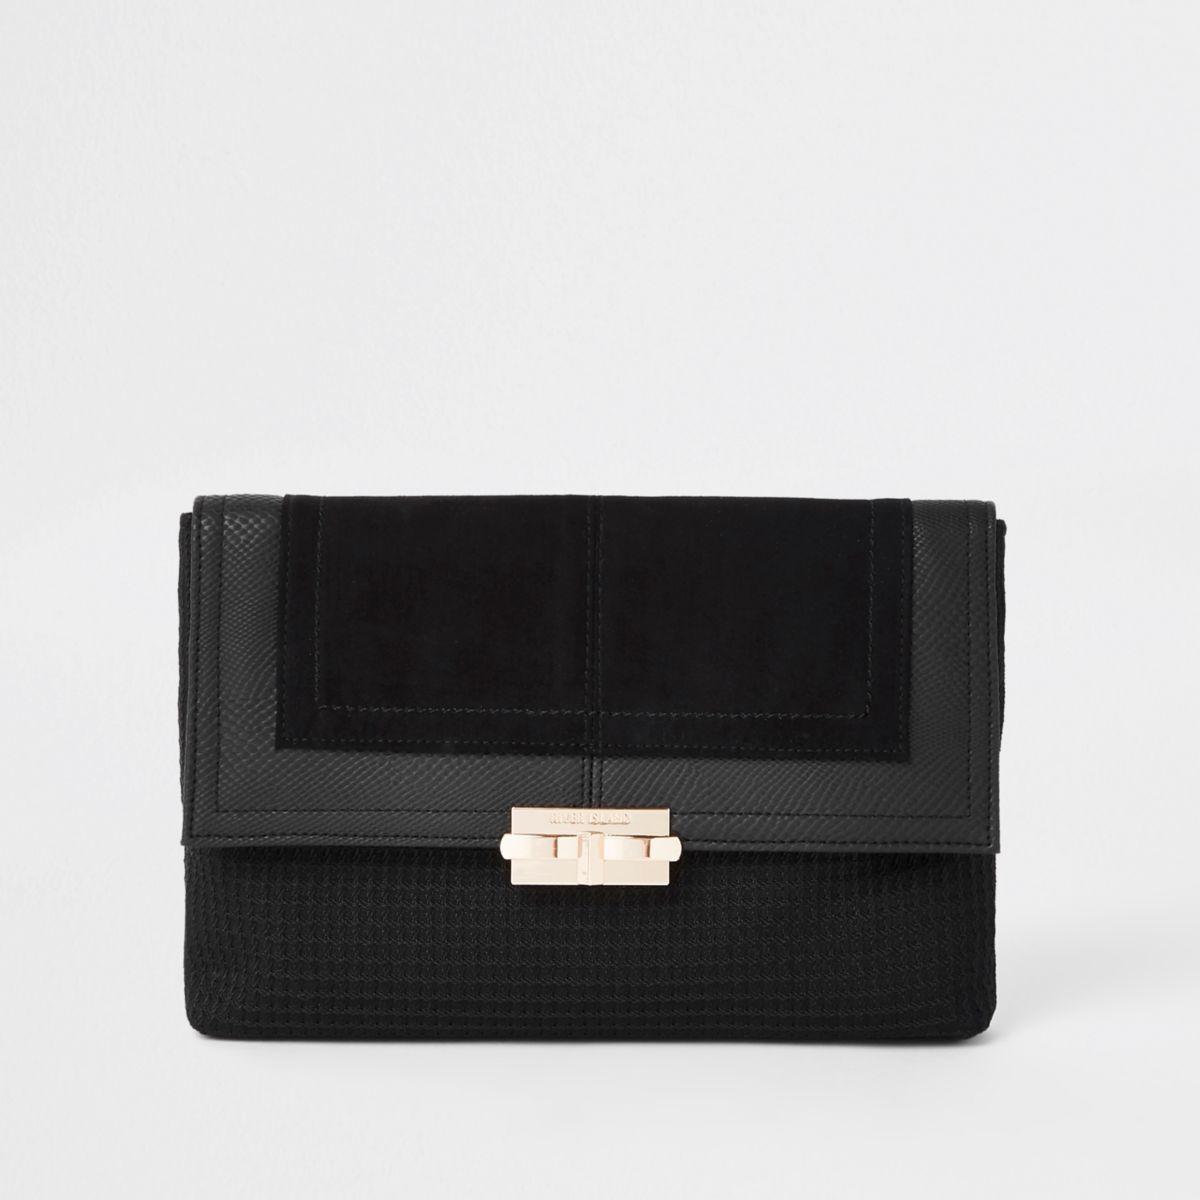 Black lock front clutch bag